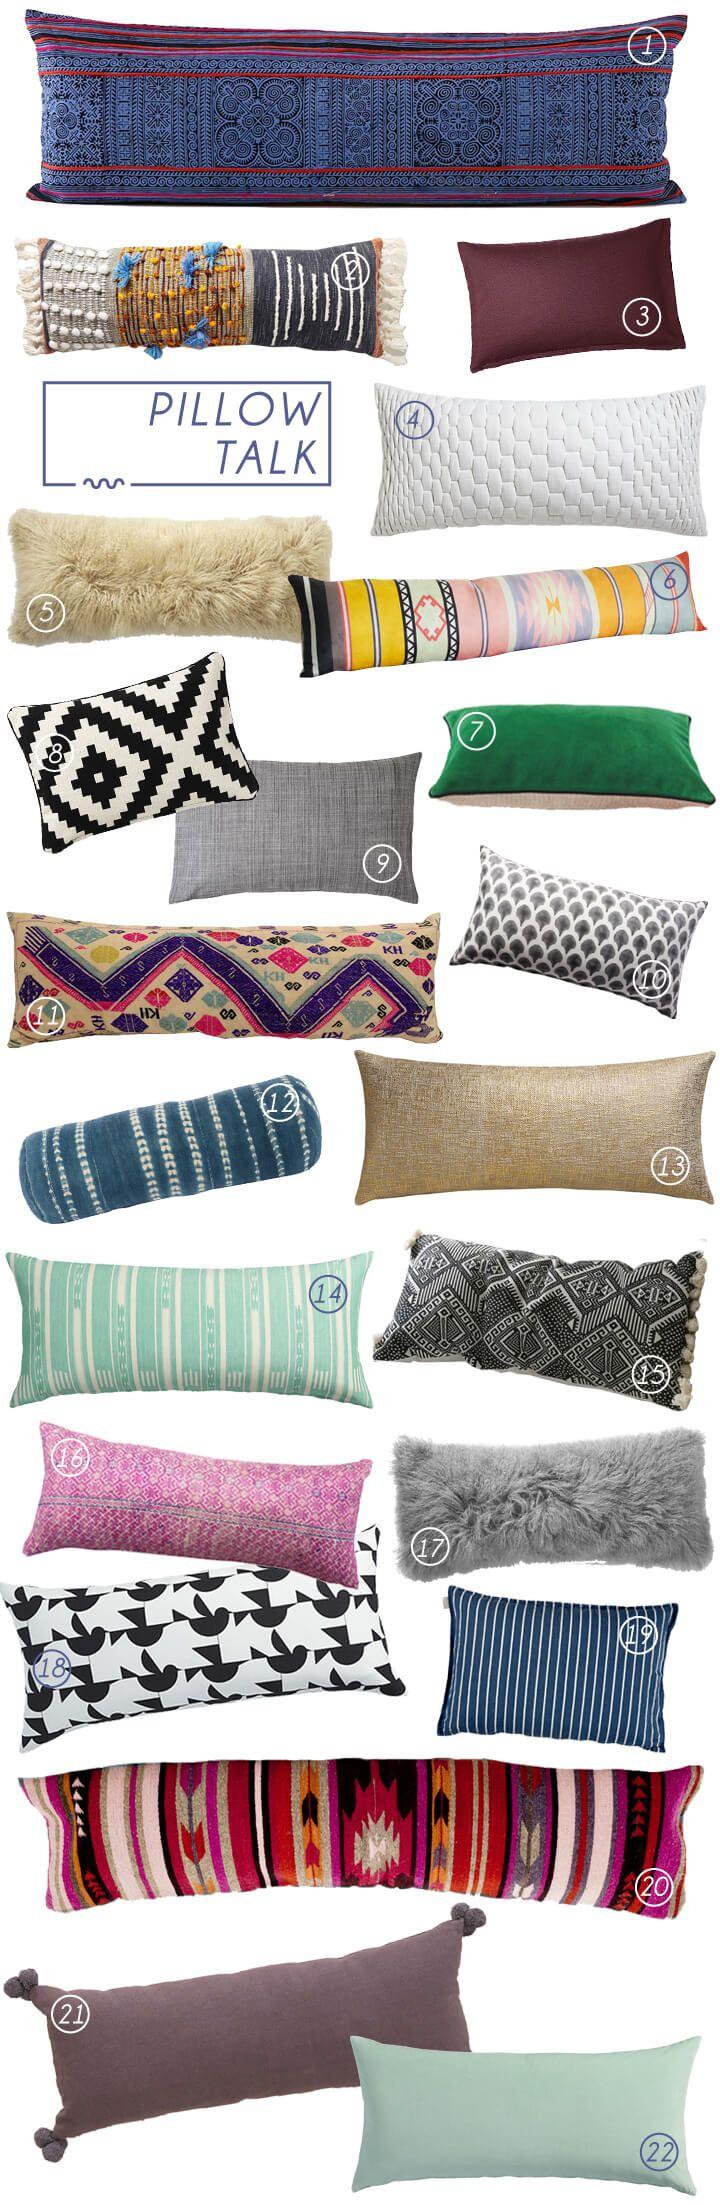 The Extra Long Pillow Emily Henderson Long Pillow Extra Large Throw Pillows Pillows Extra large throw pillows